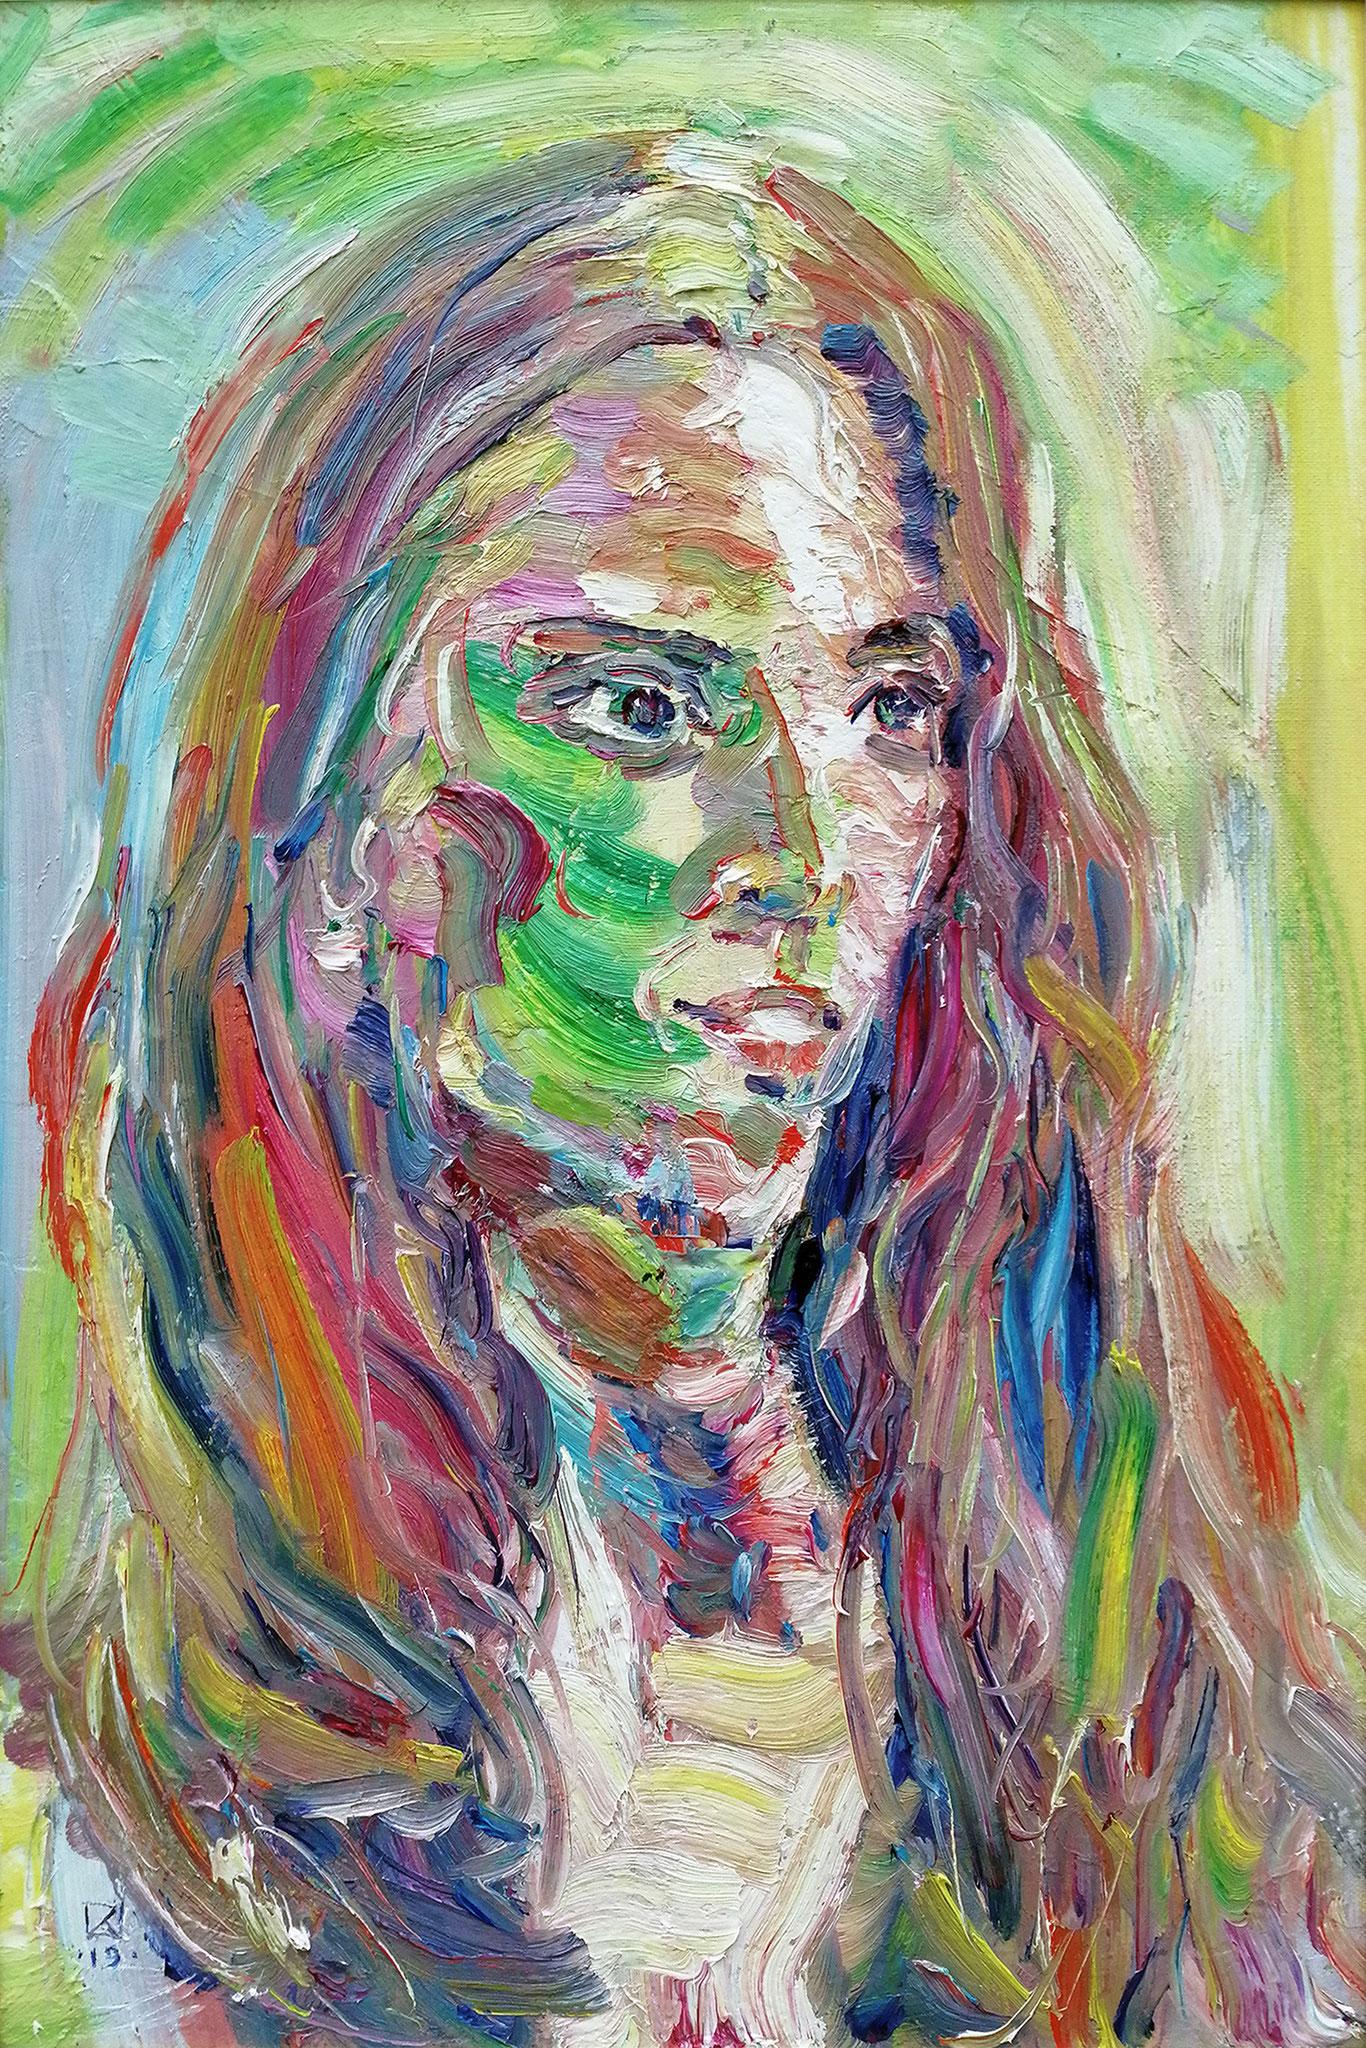 Portrait of a Girl. 2019. Oil on canvas, cardboard. 60 x 40